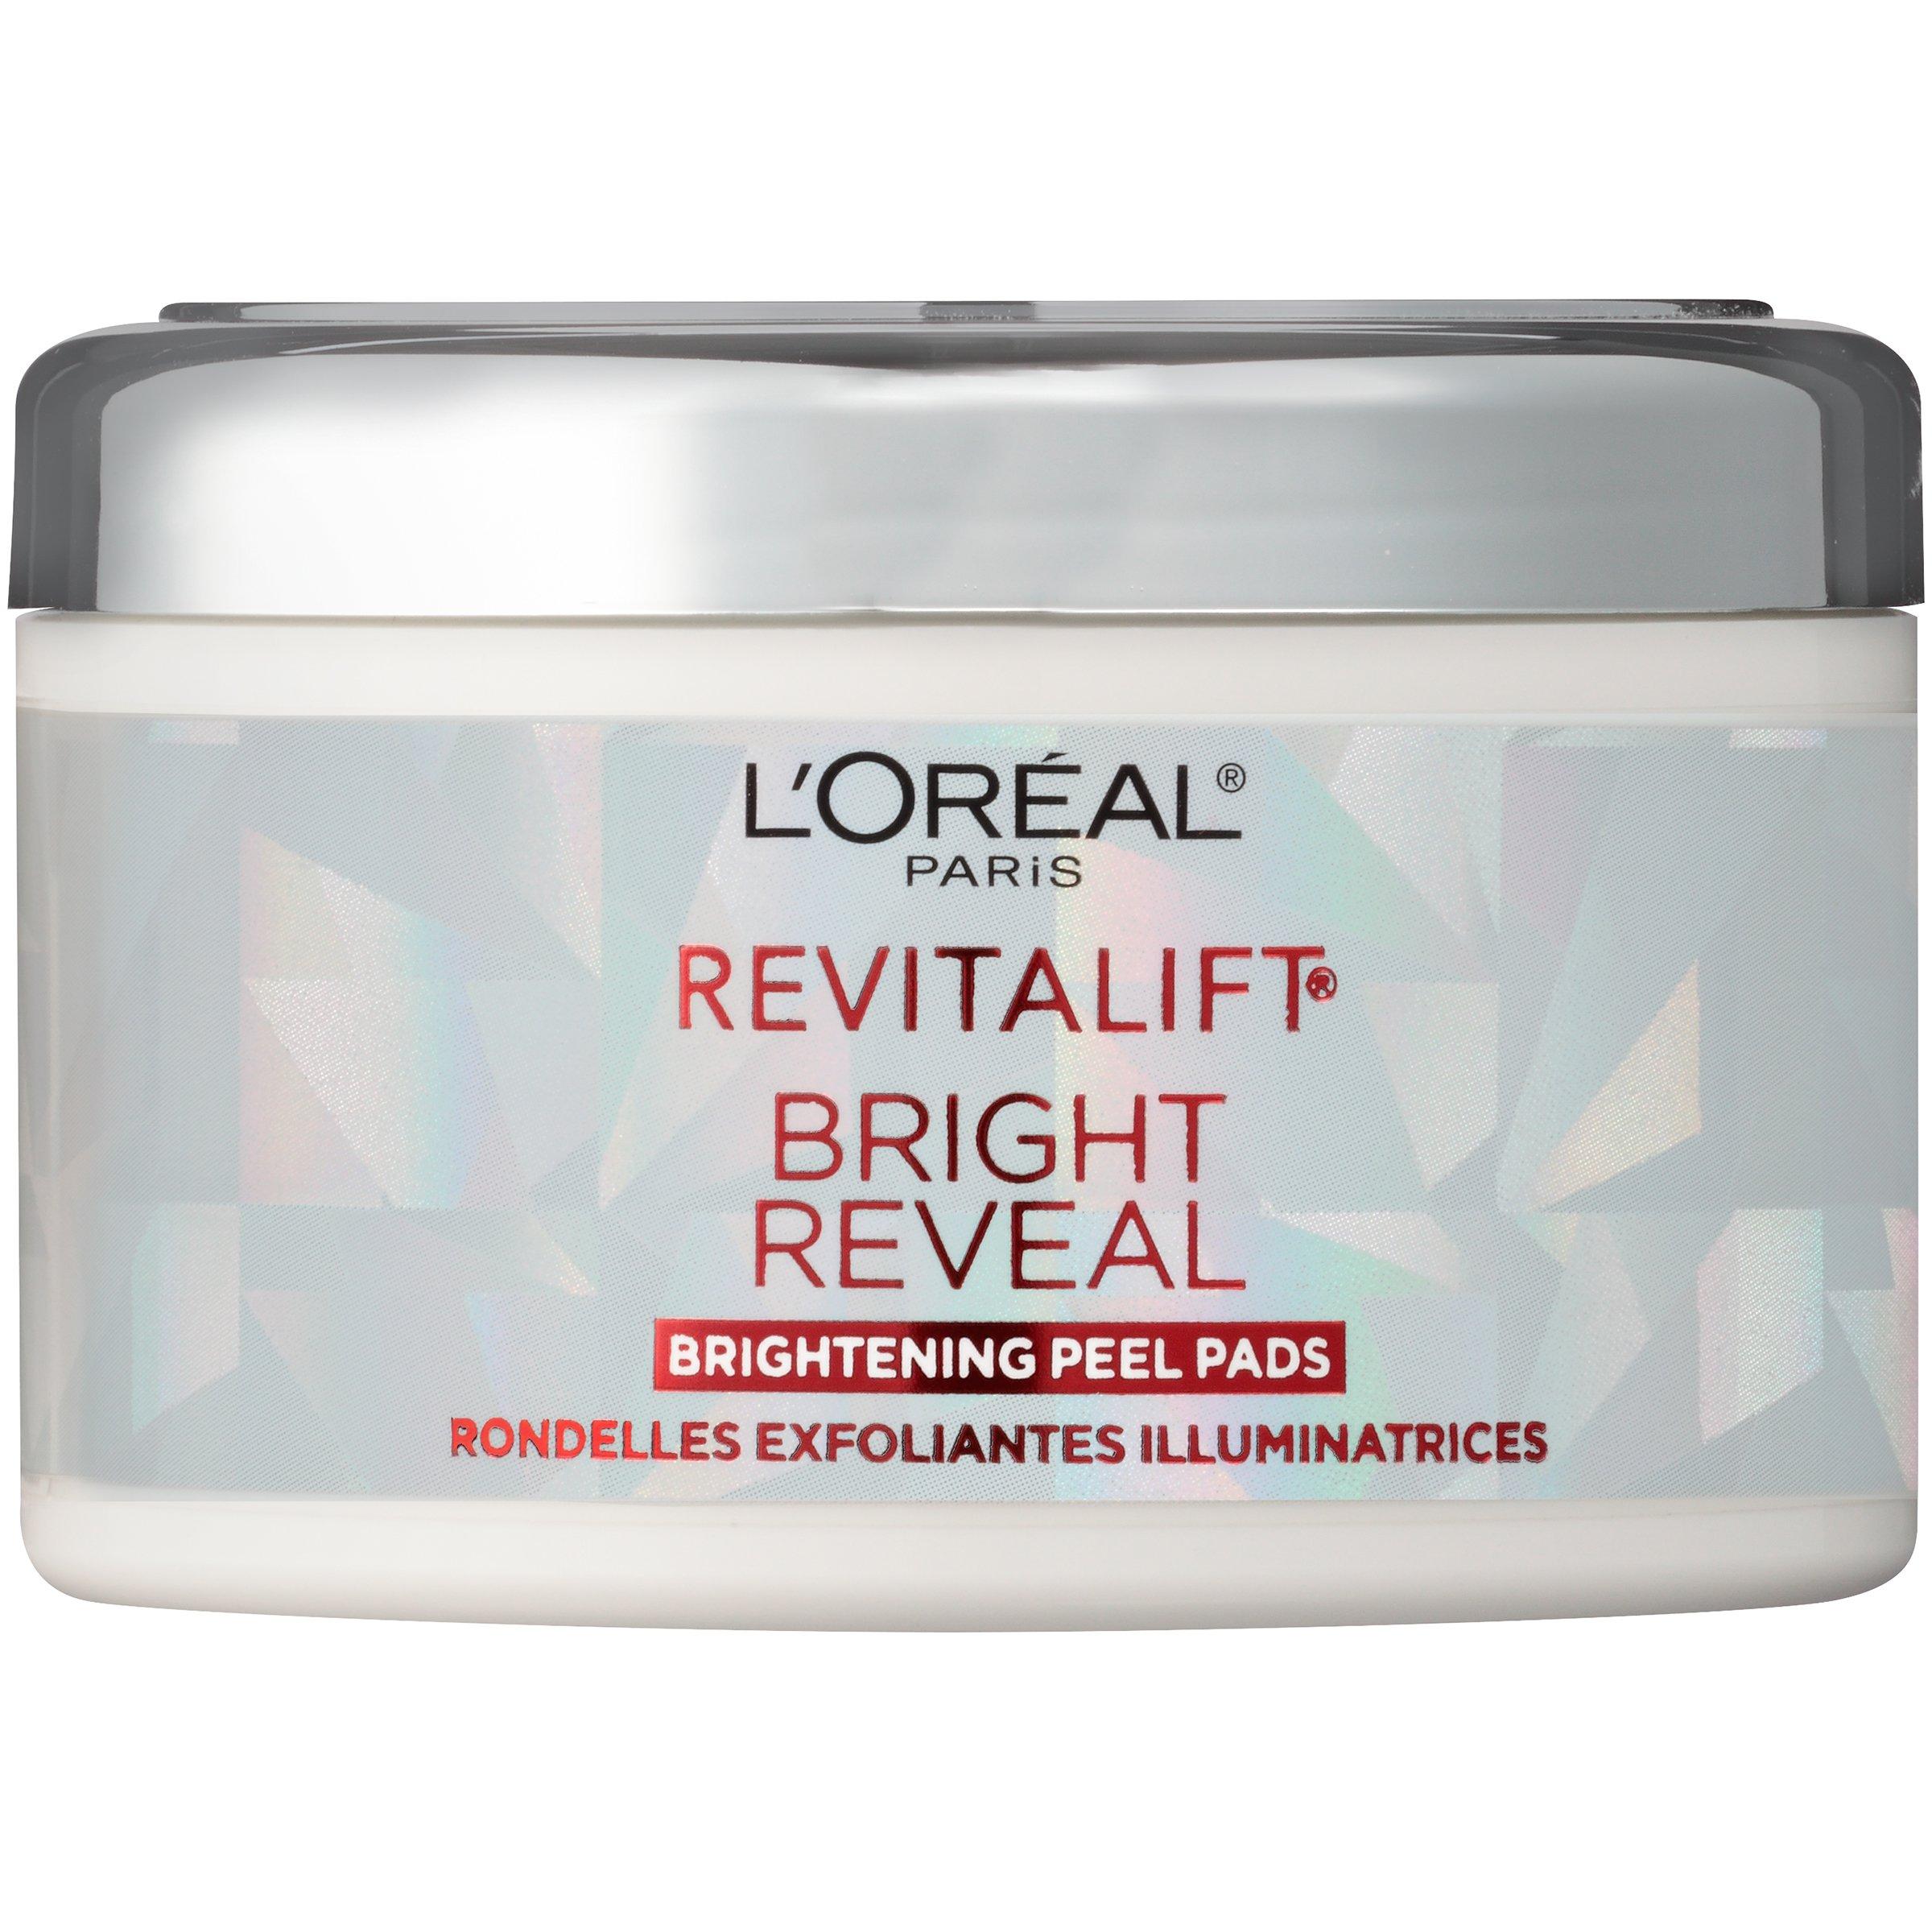 L'Oréal Paris Revitalift Bright Reveal Peel Pads, 30 ct.